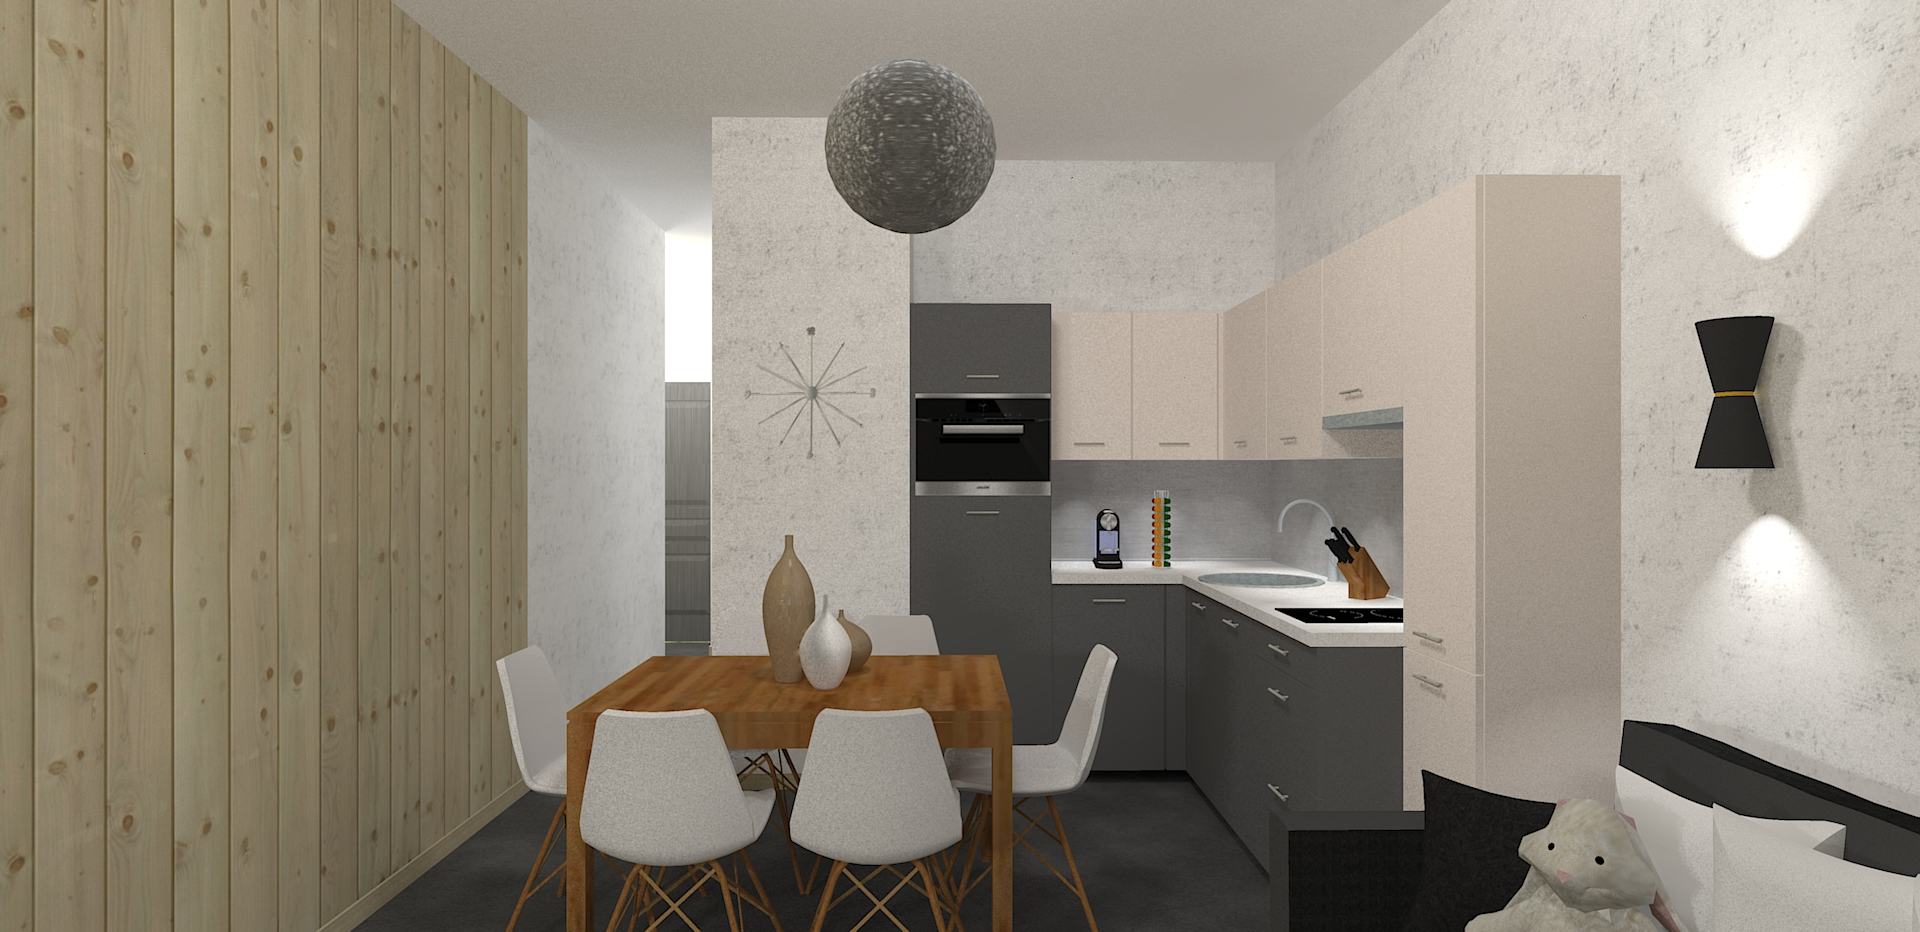 au lotys megevette novembre 2016 aura projets d. Black Bedroom Furniture Sets. Home Design Ideas